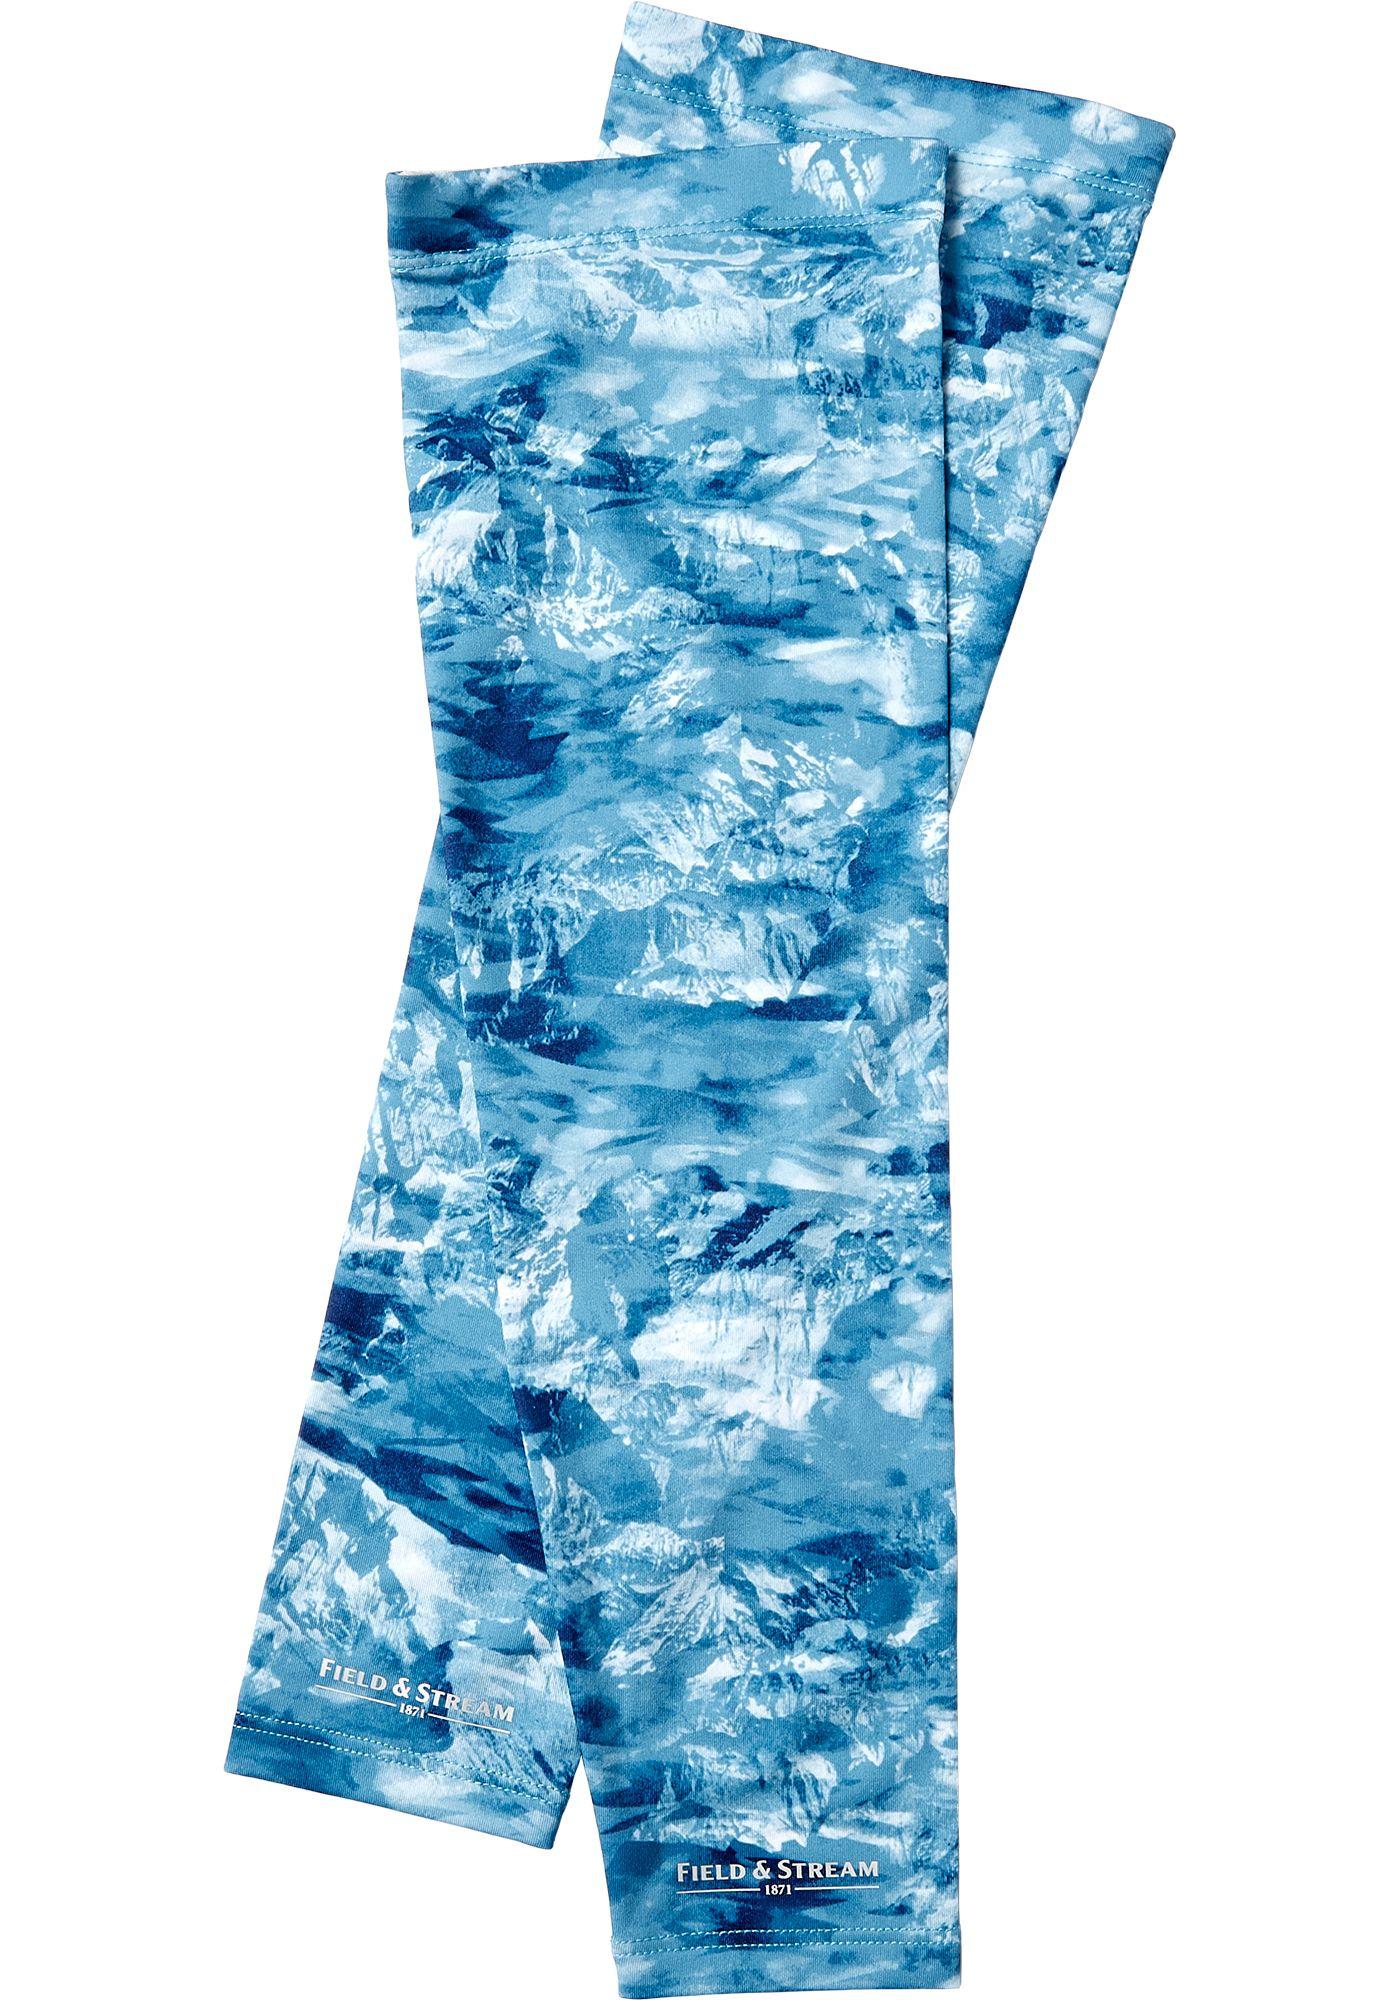 Field & Stream Evershade Arm Sleeves